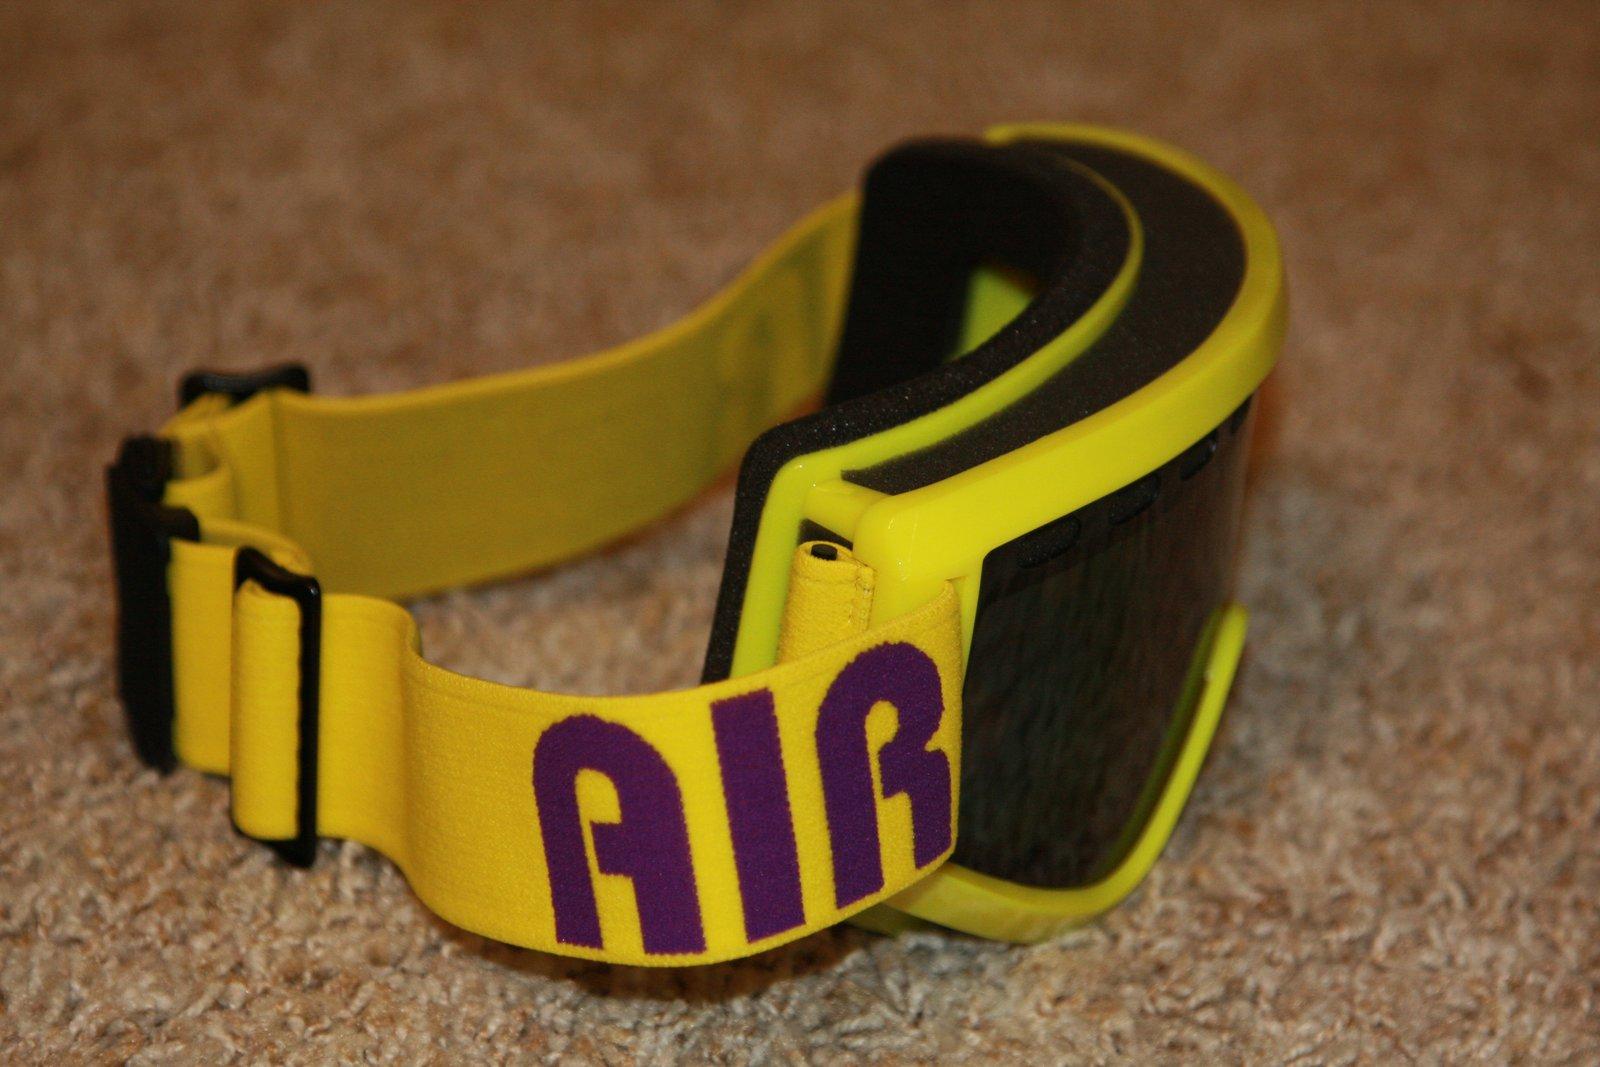 Airgoggles1